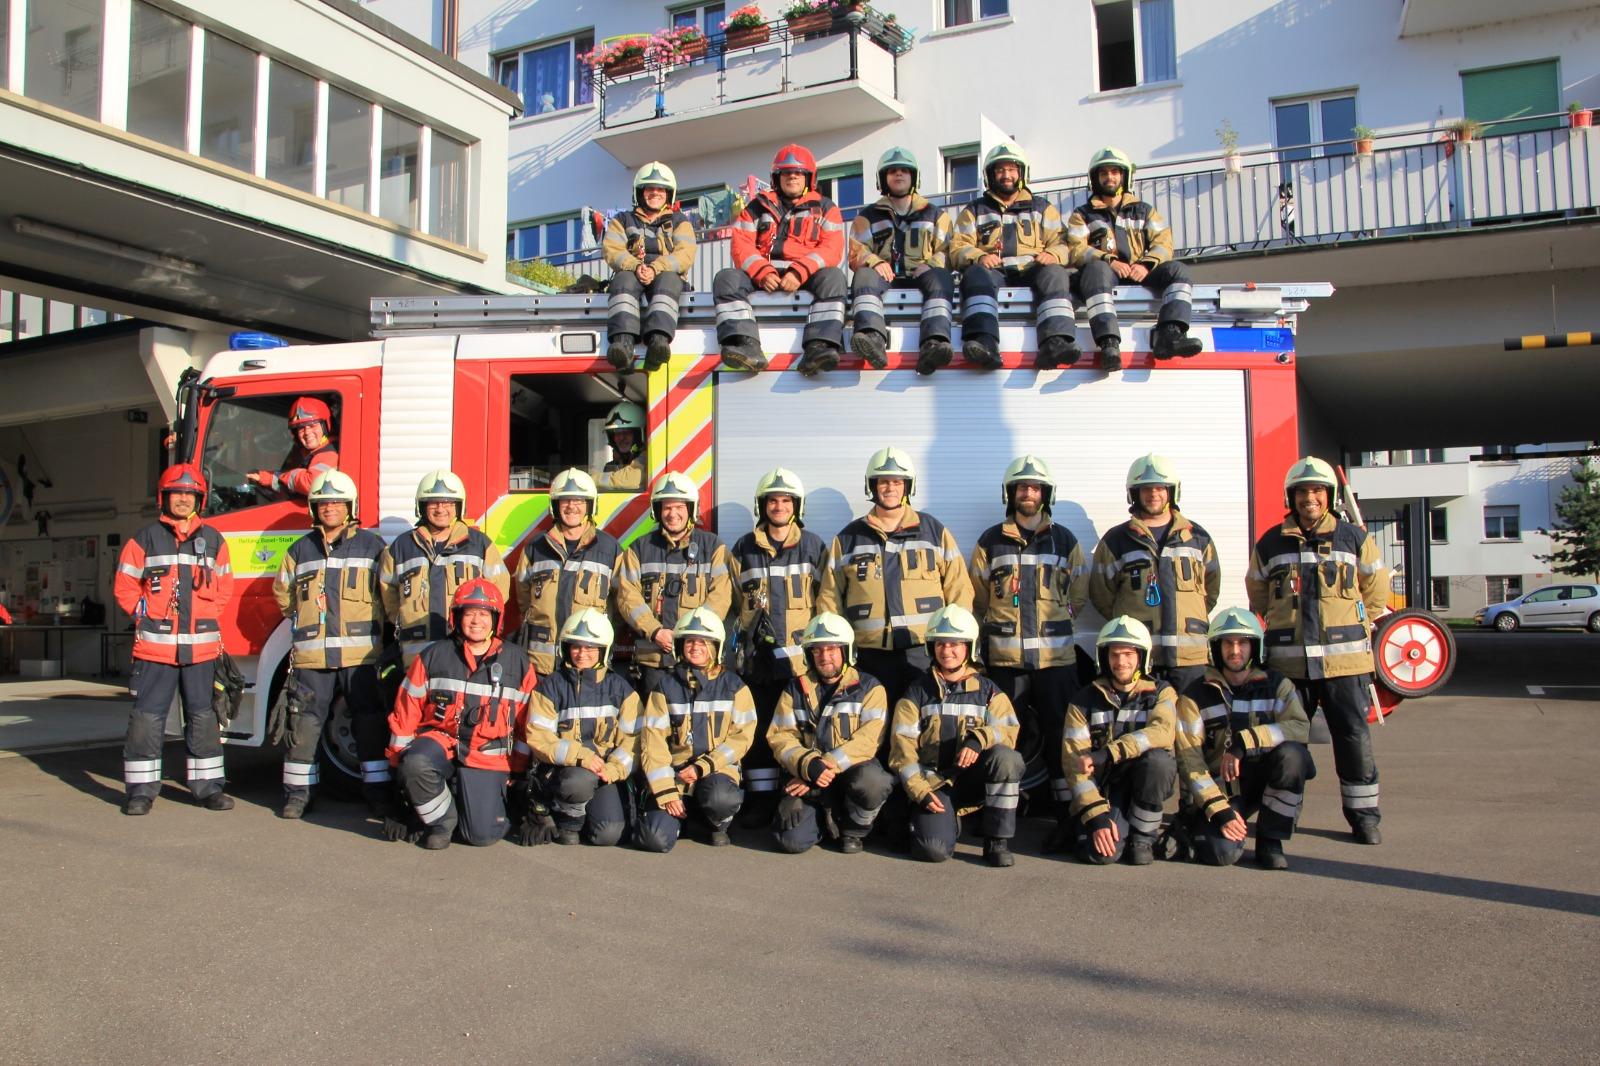 Feuerwehr bettingen eifelwetter napoli inter milan betting line